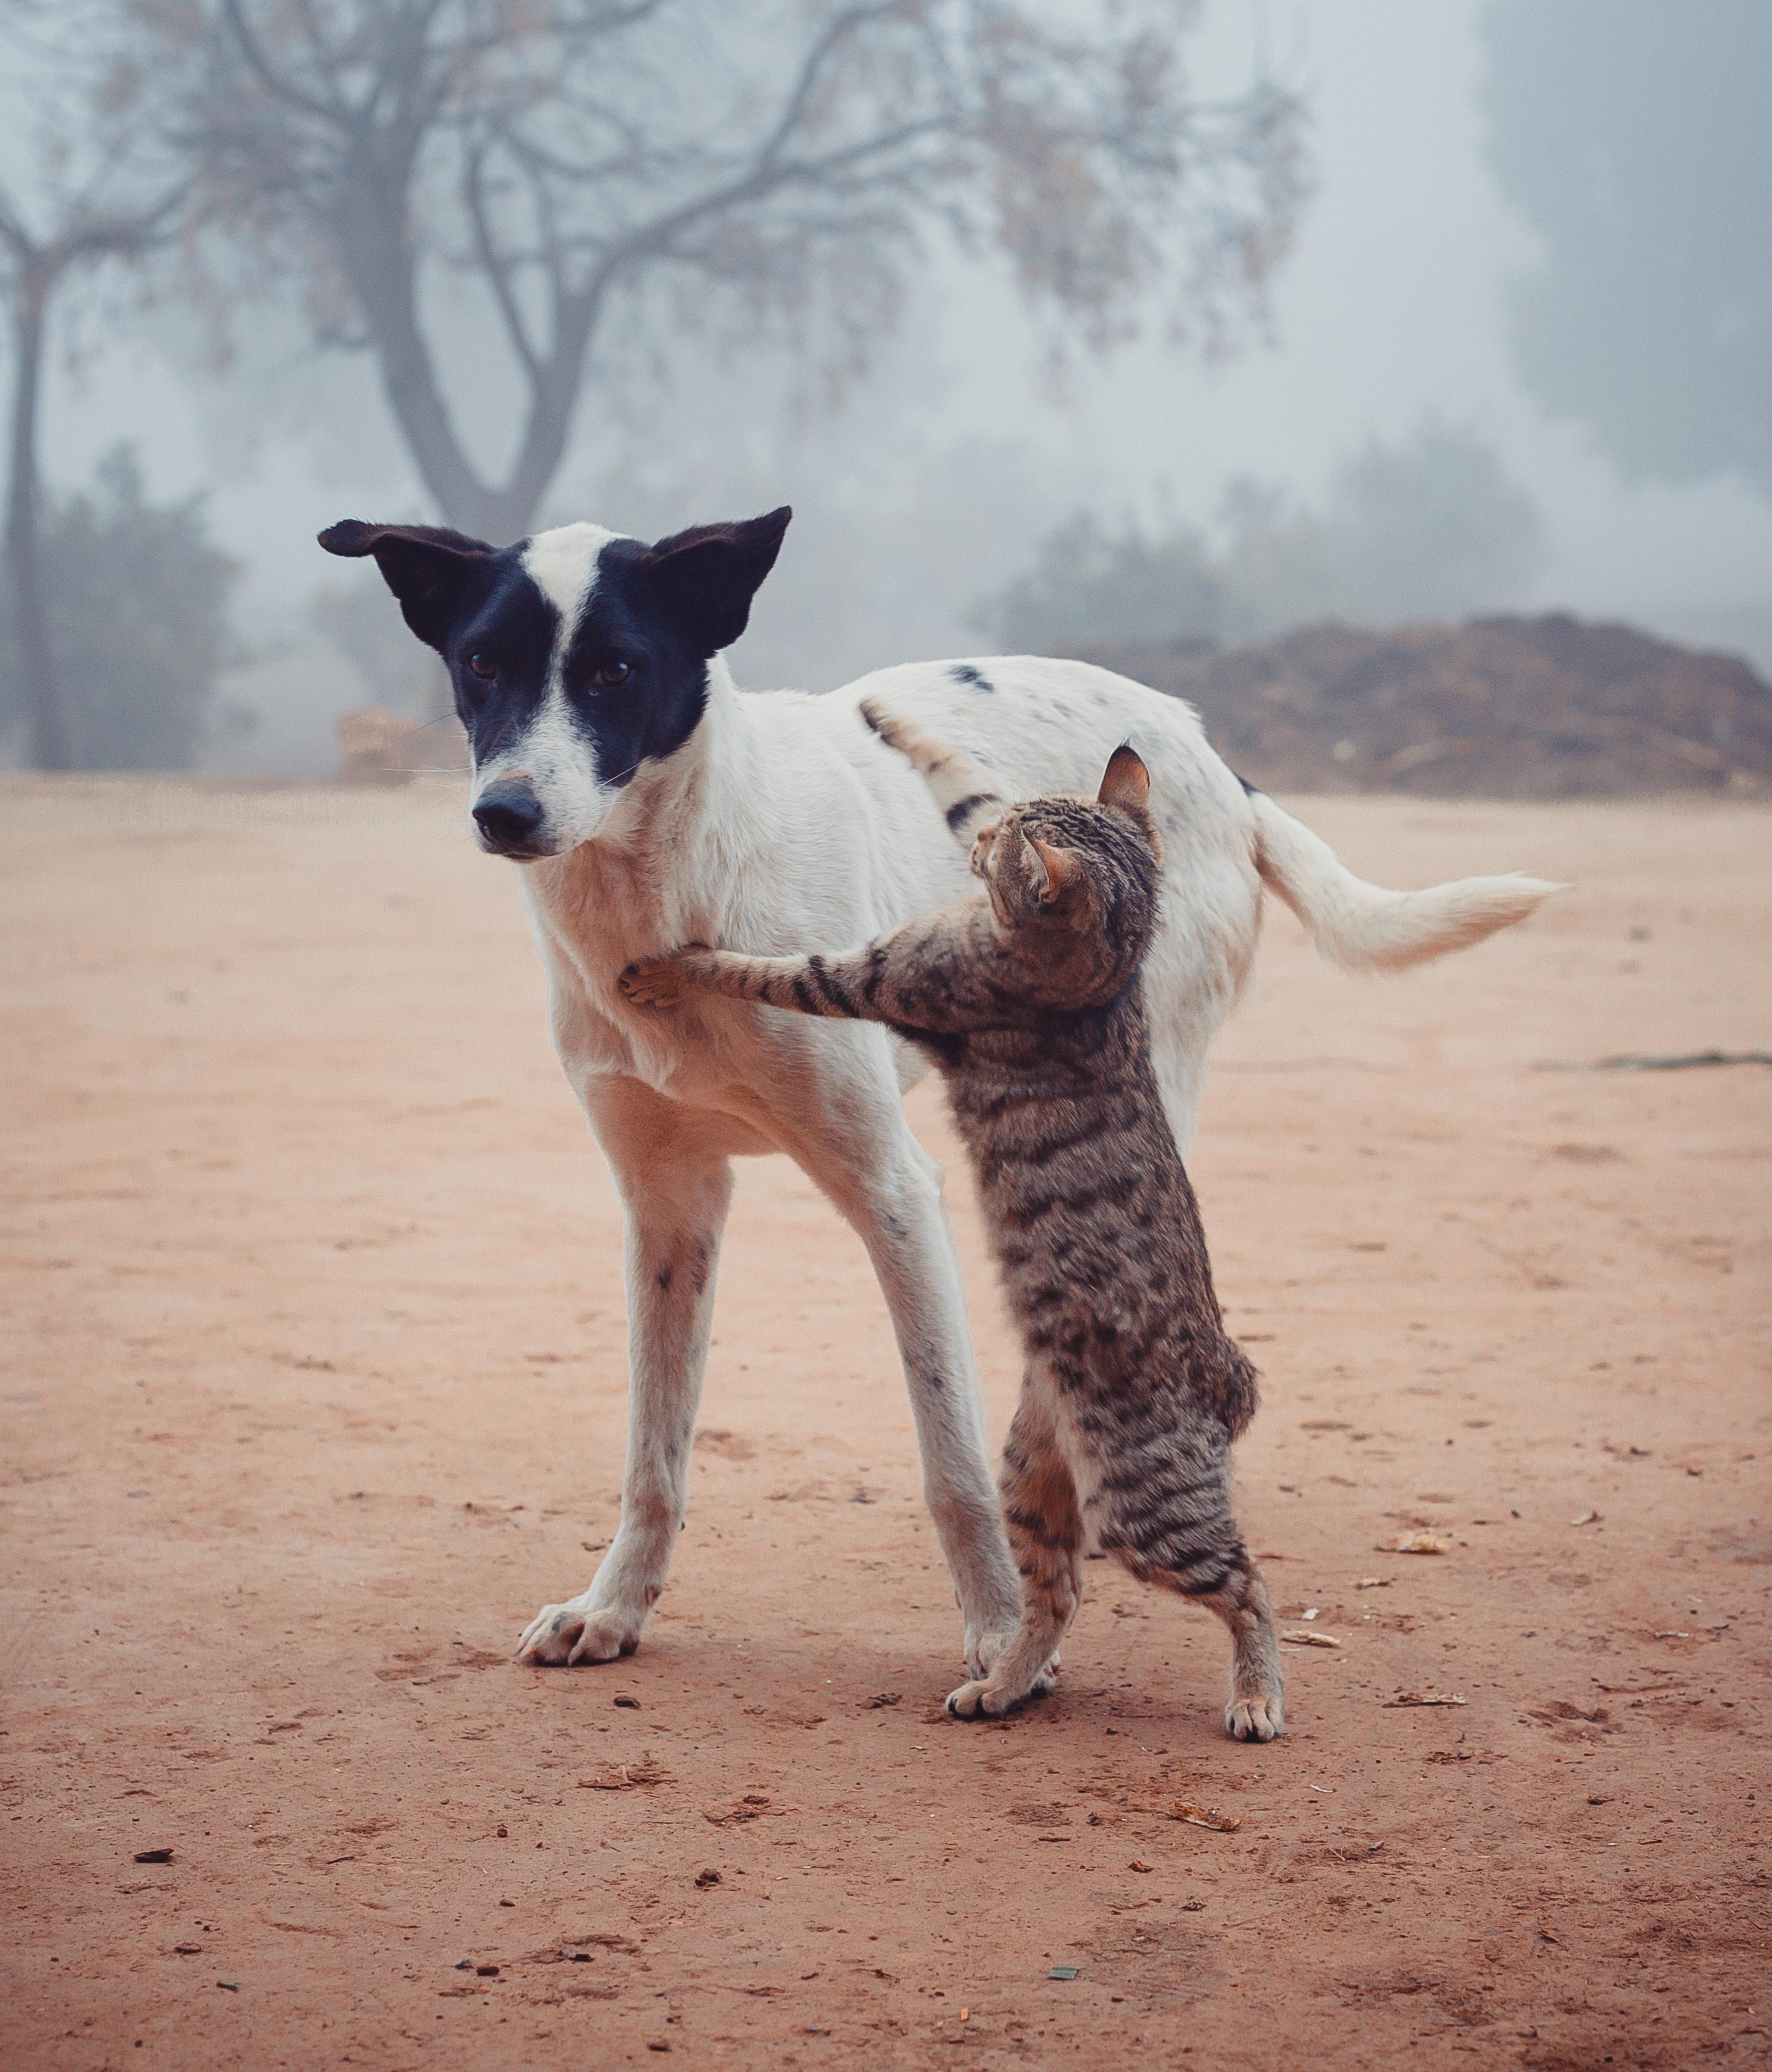 stray cat and dog